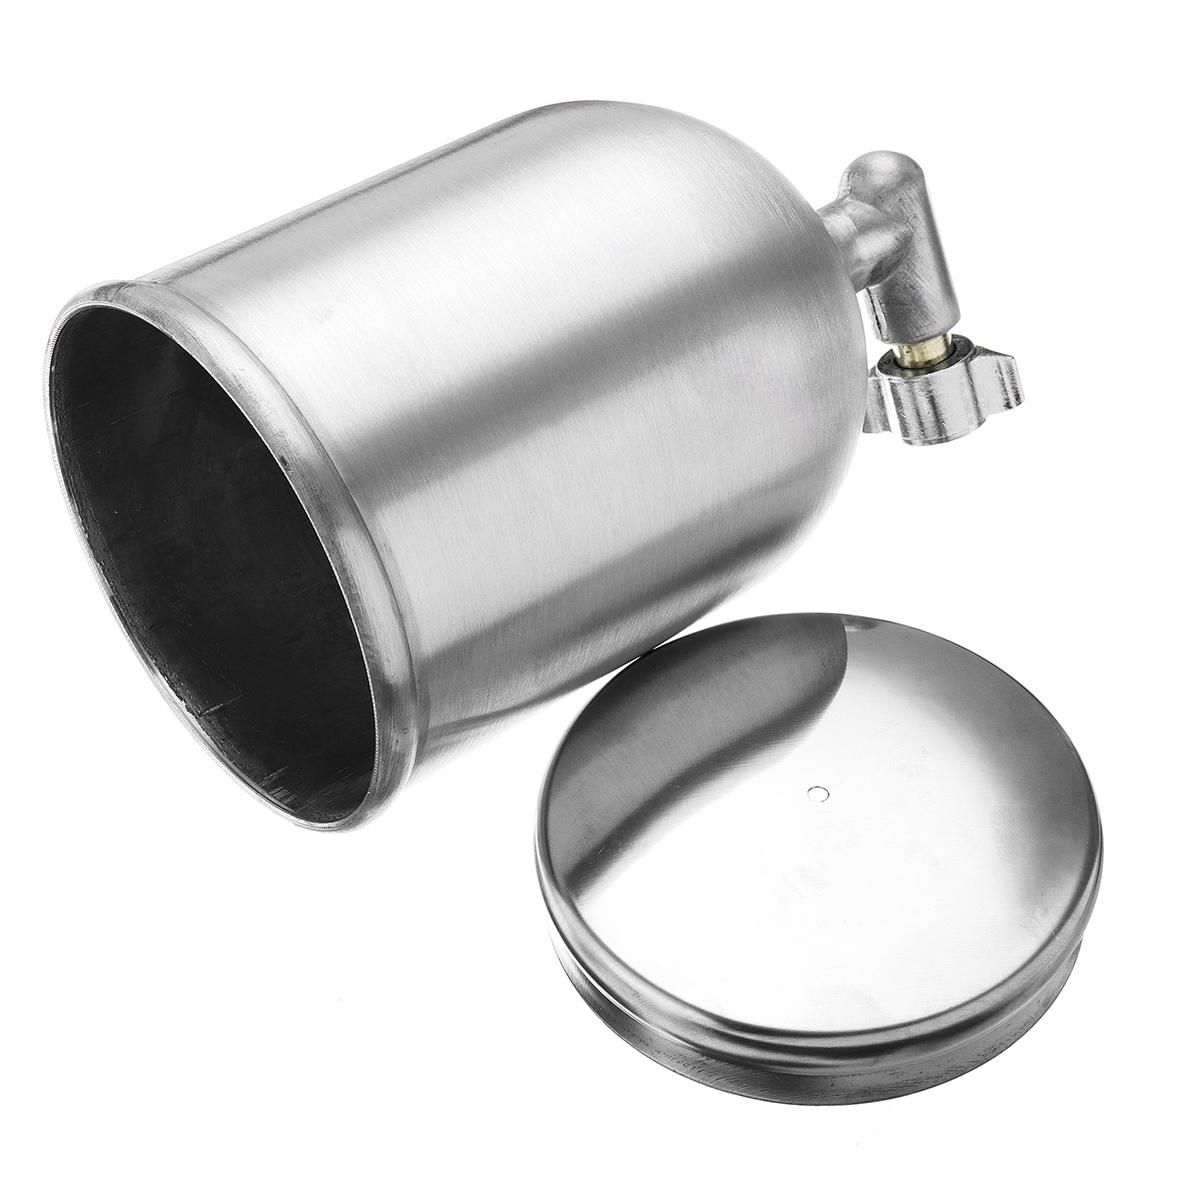 F75G 1.5MM Nozzle Professional Paint Spray Airbrush Mini Air Paint Spray Airbrush